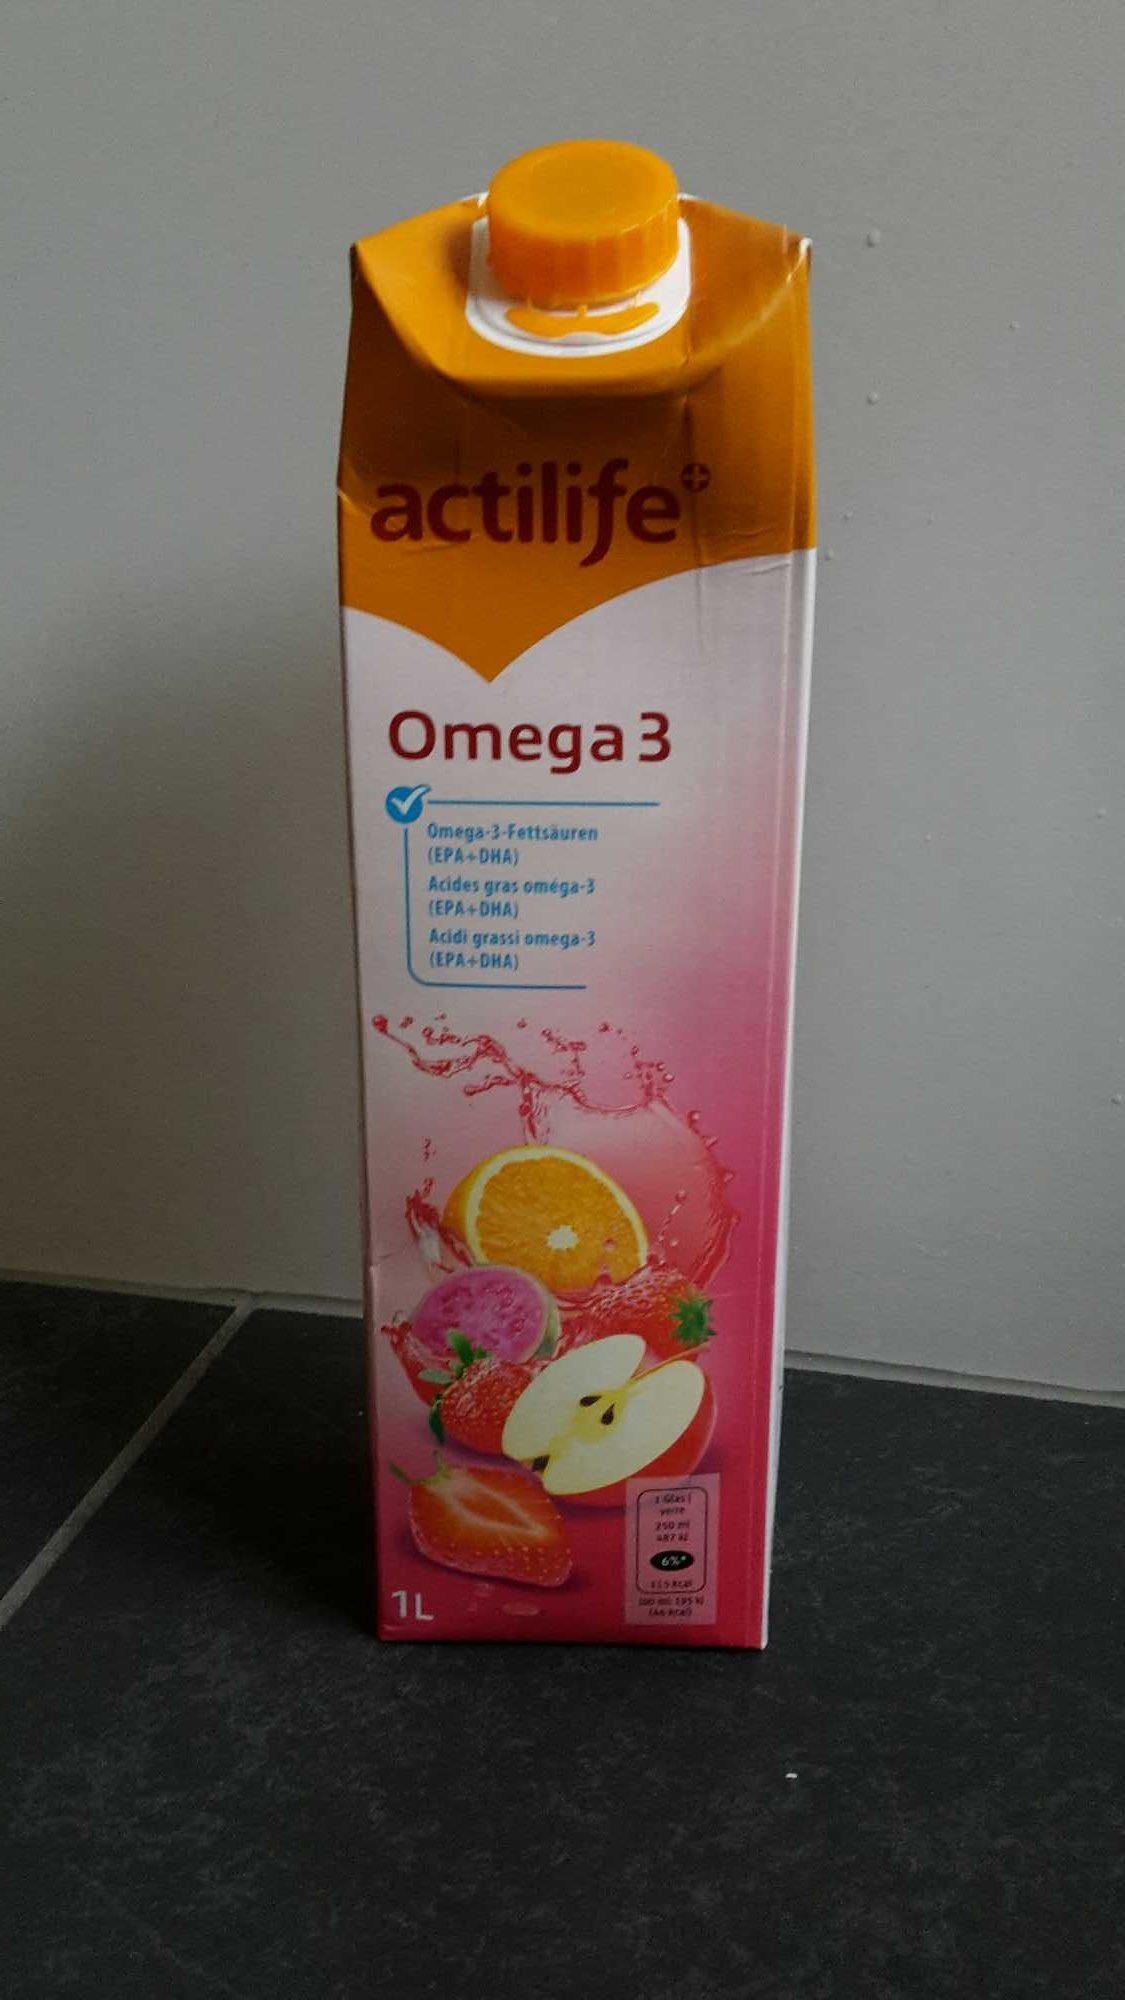 Omega 3 - Product - fr